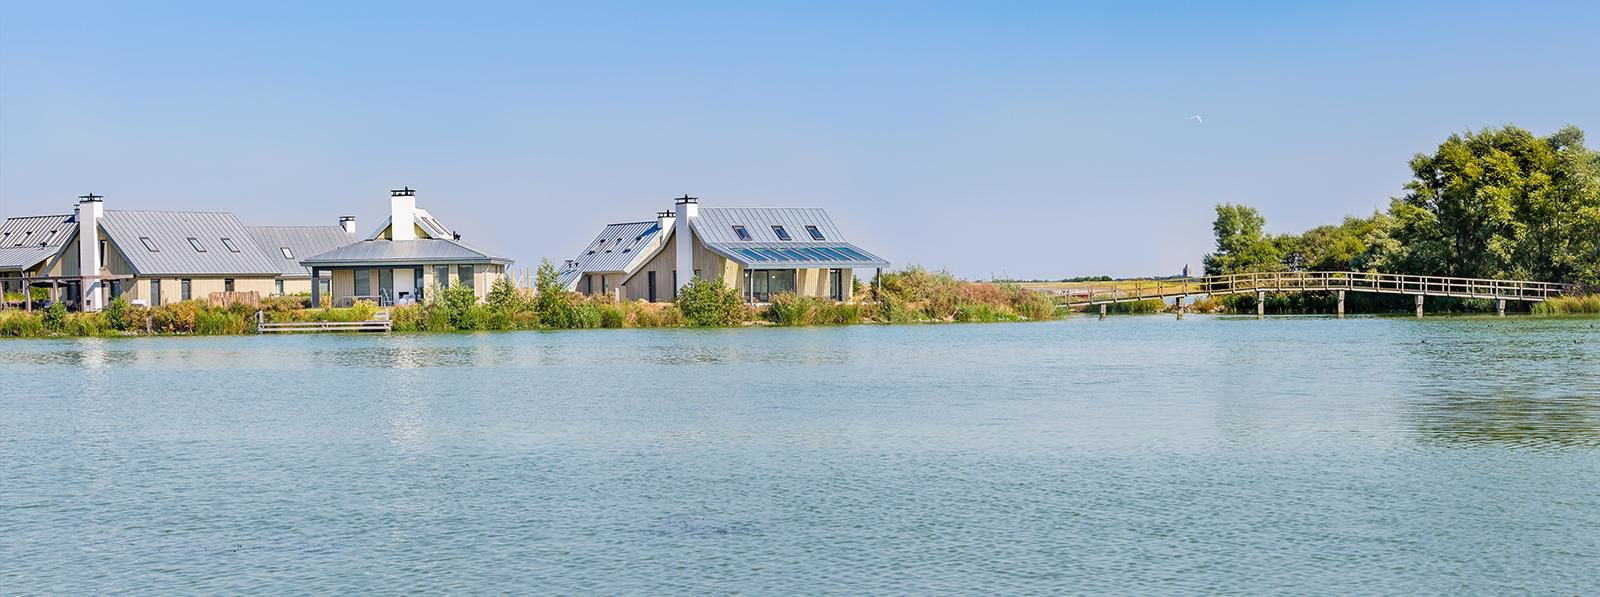 Holiday resort at the waterside